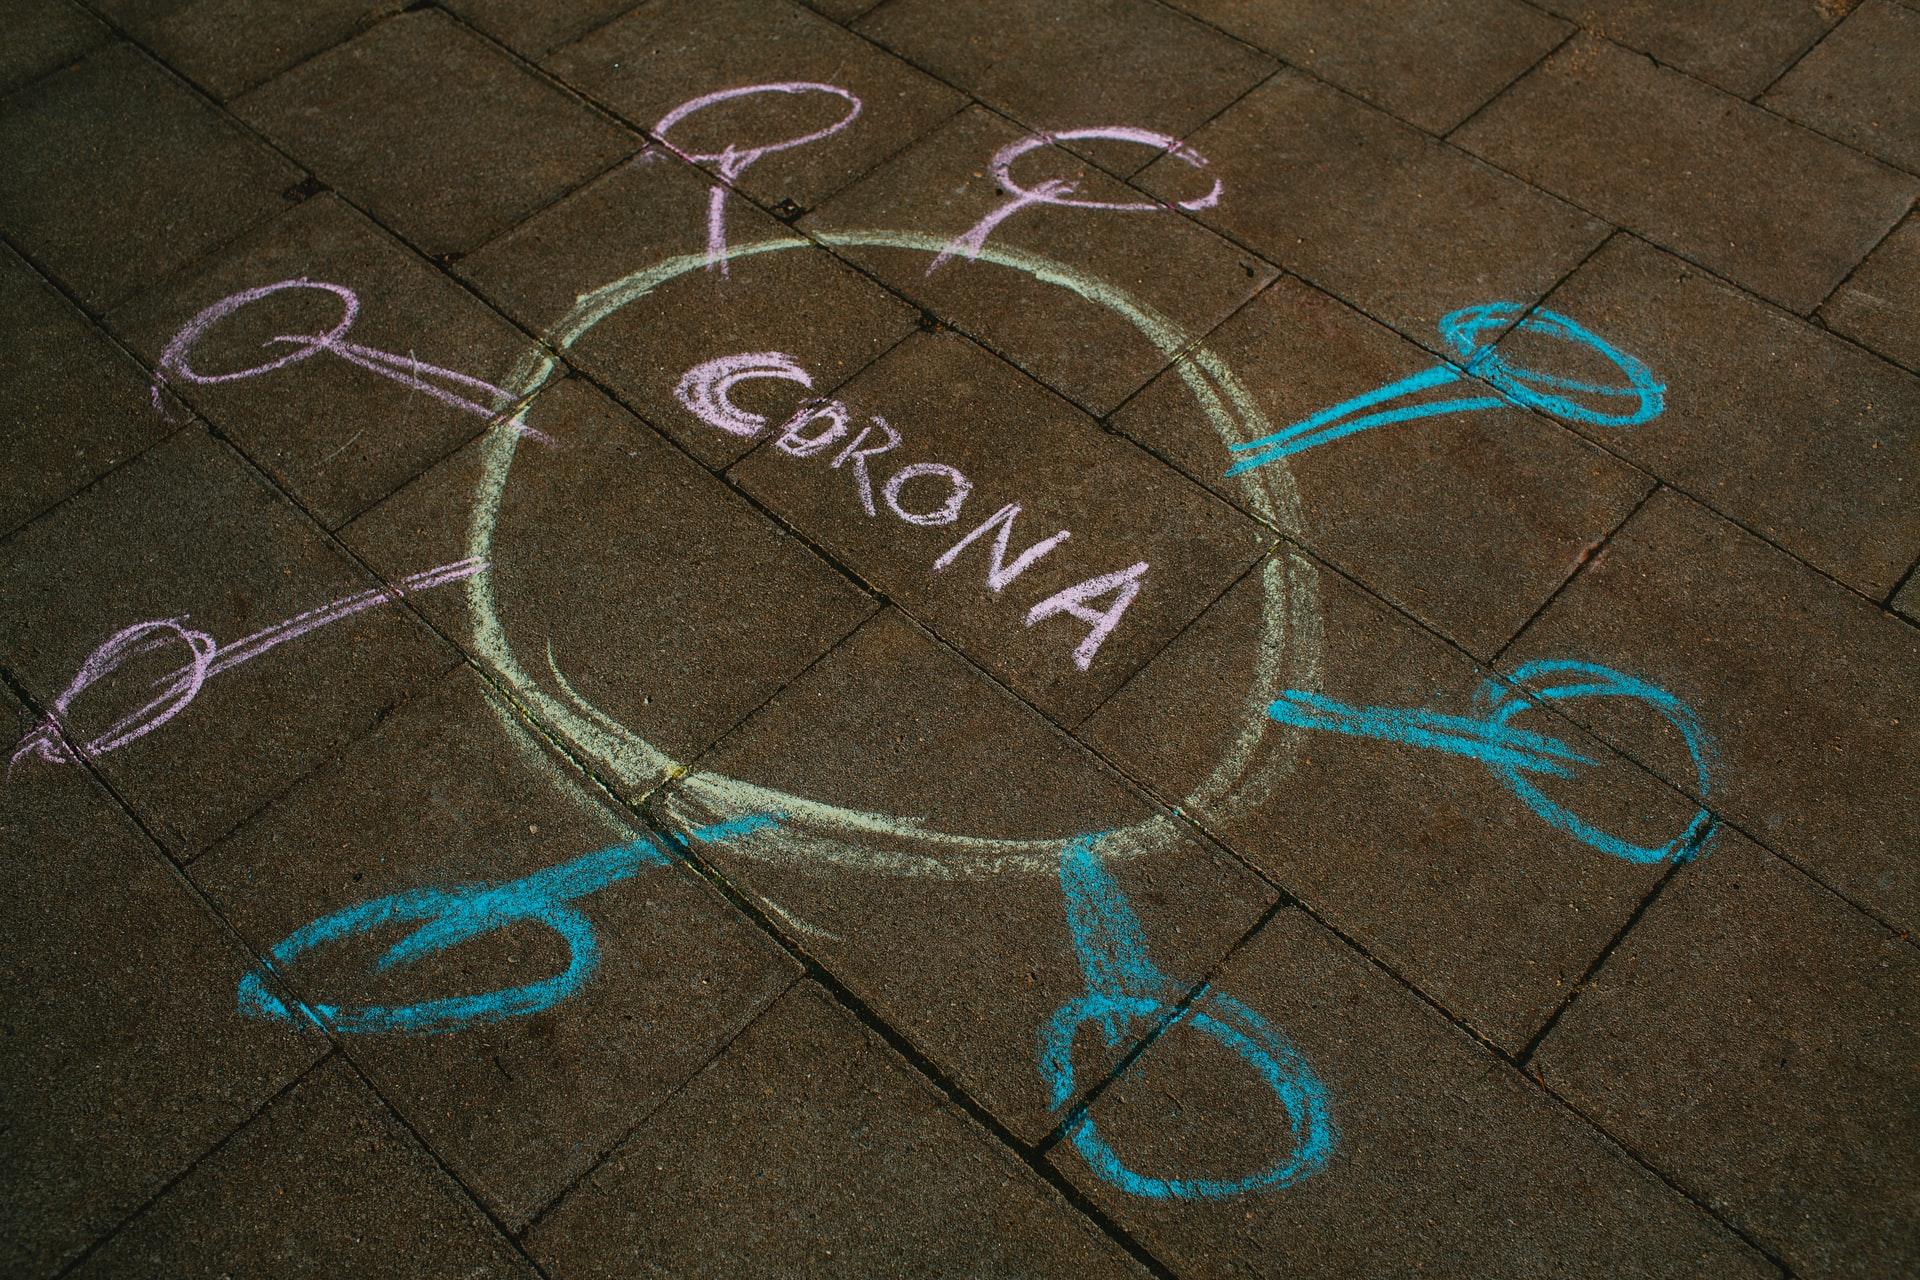 Usaha Yang Cocok Di Tengah Pandemi Corona Money Plus